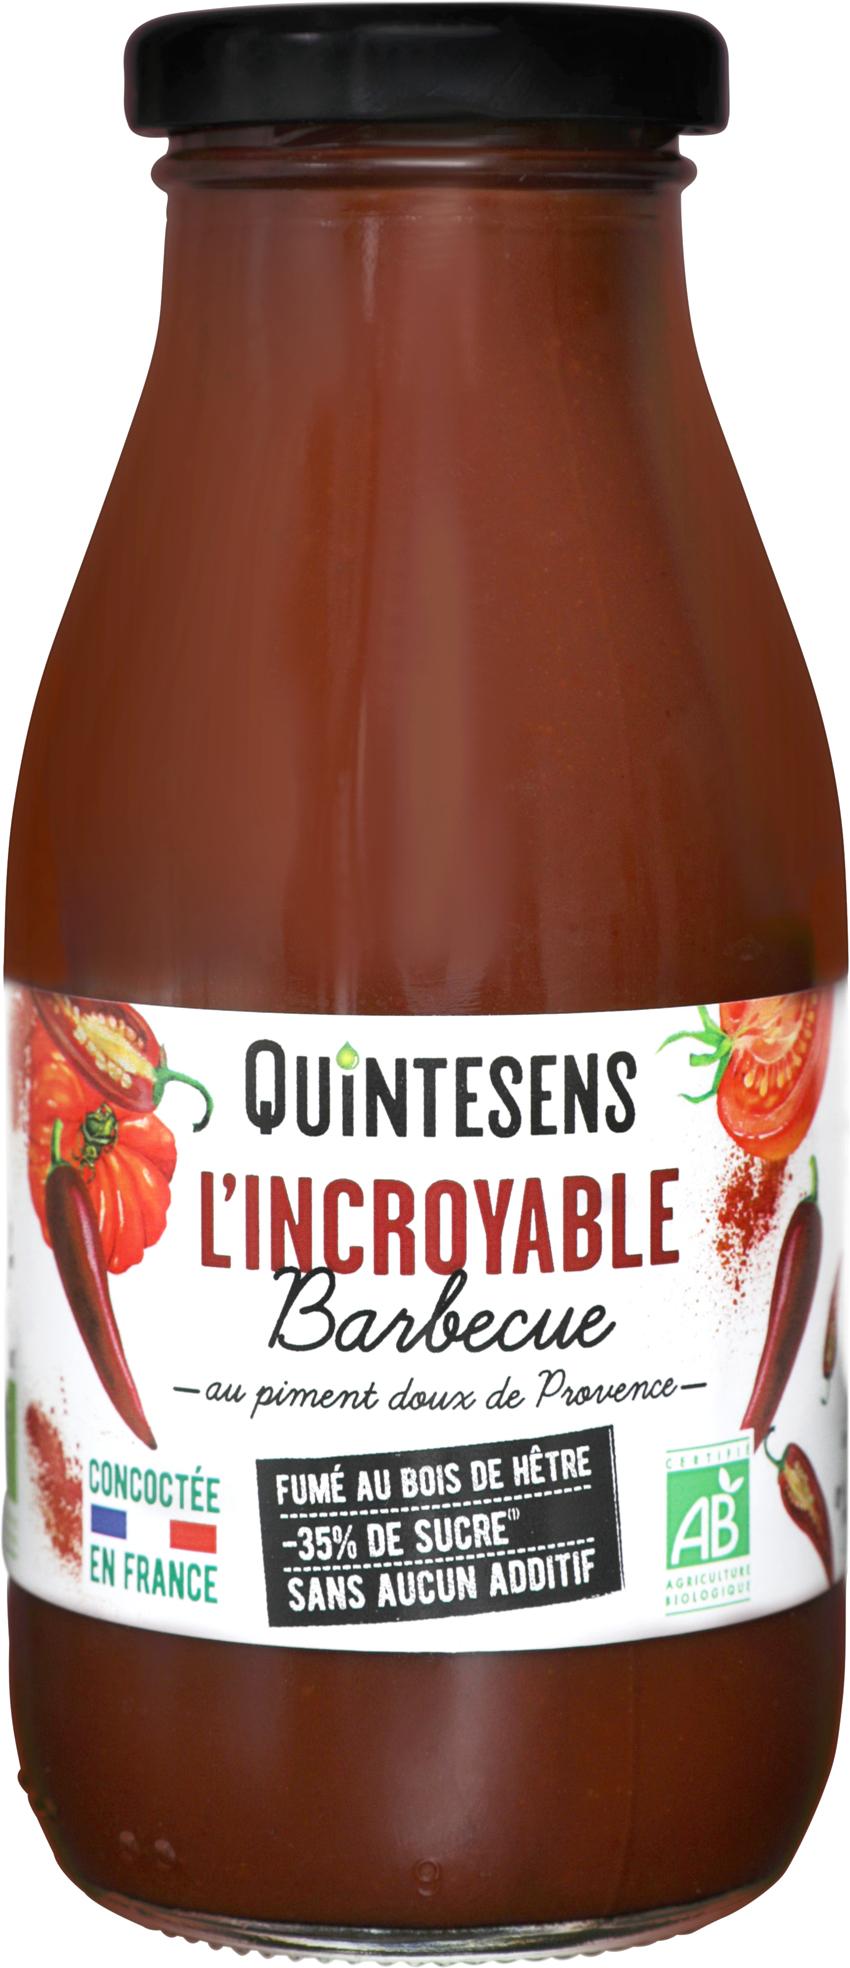 incroyable barbecue 1 - Des sauces Barbecue et Burger saines et Bio